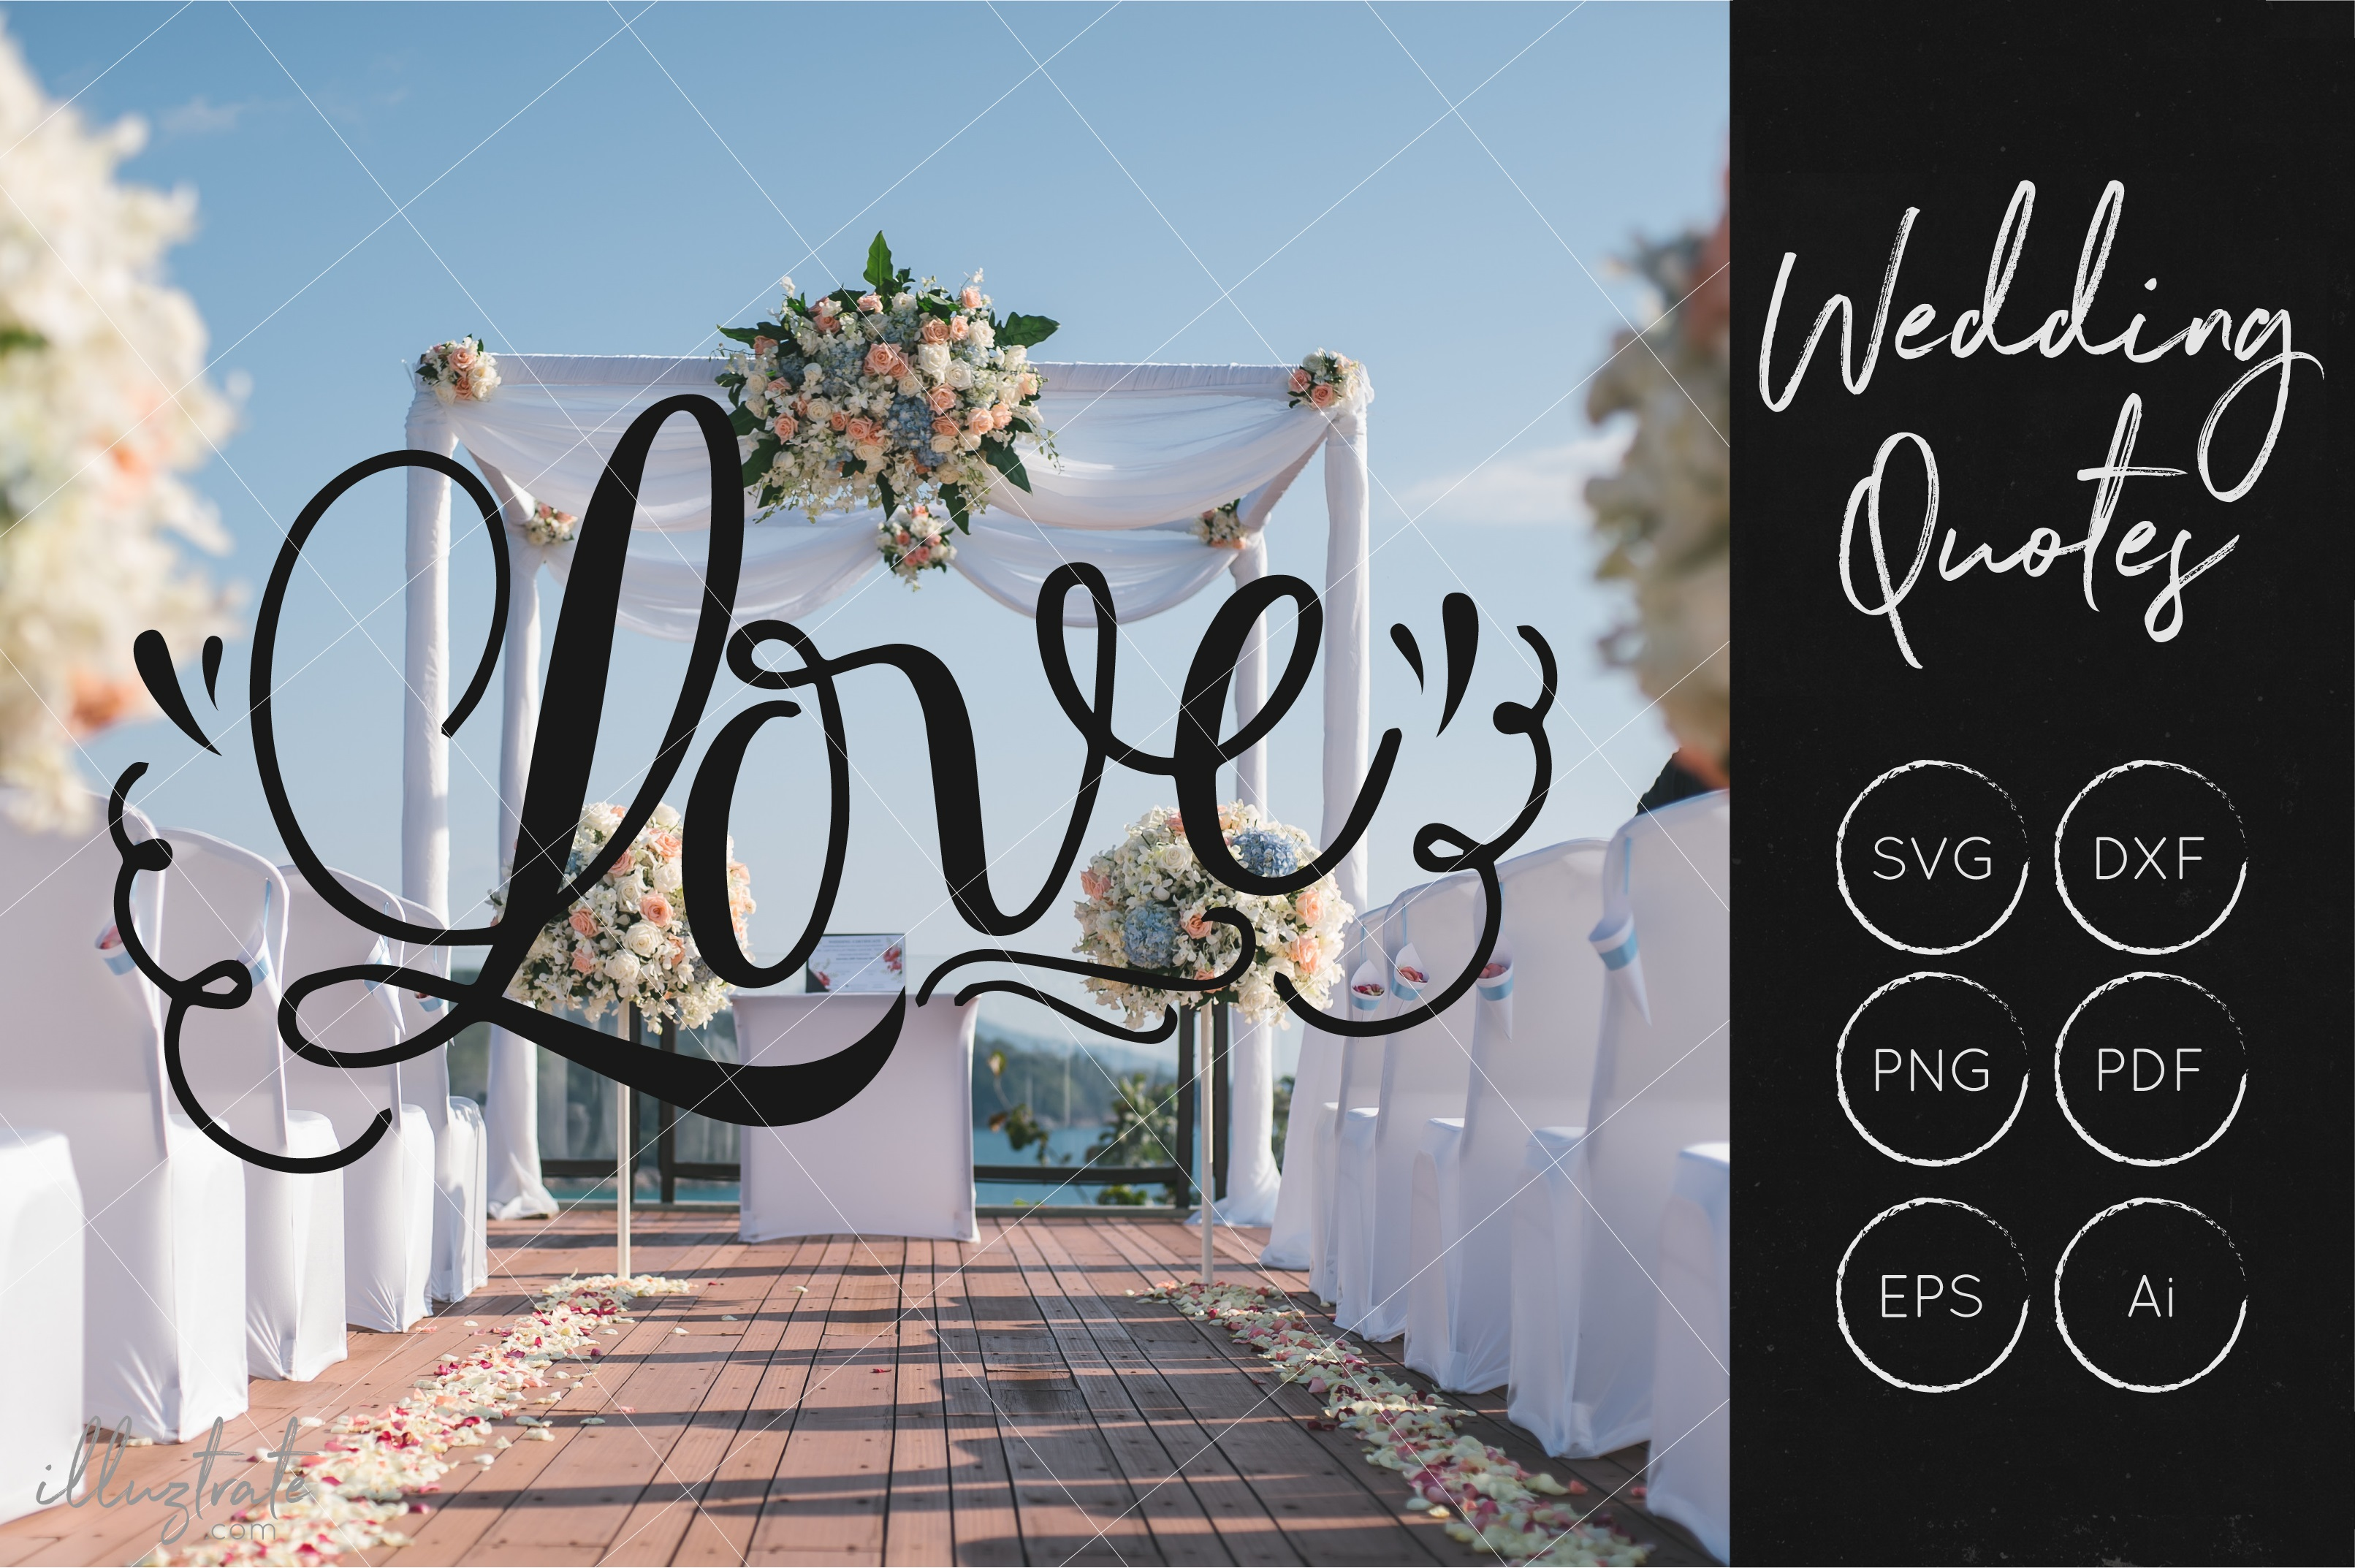 Wedding SVG Cut Files Bundle - Wedding Quotes - Wedding SVG example image 2